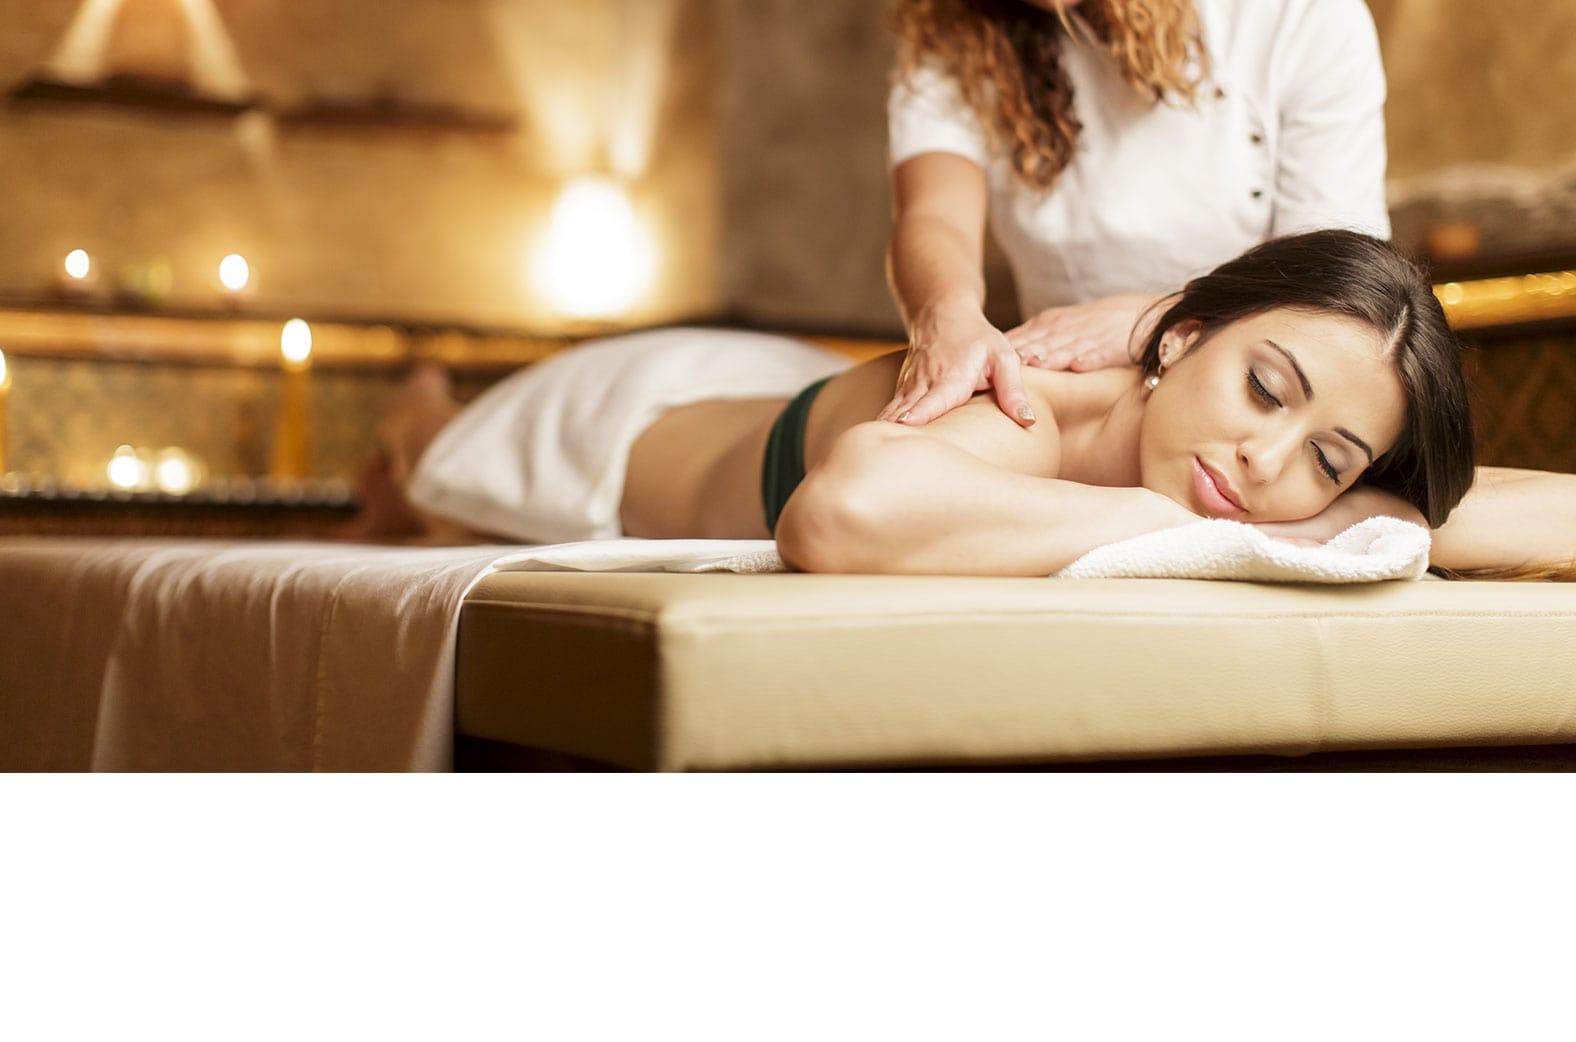 soul-contact massage